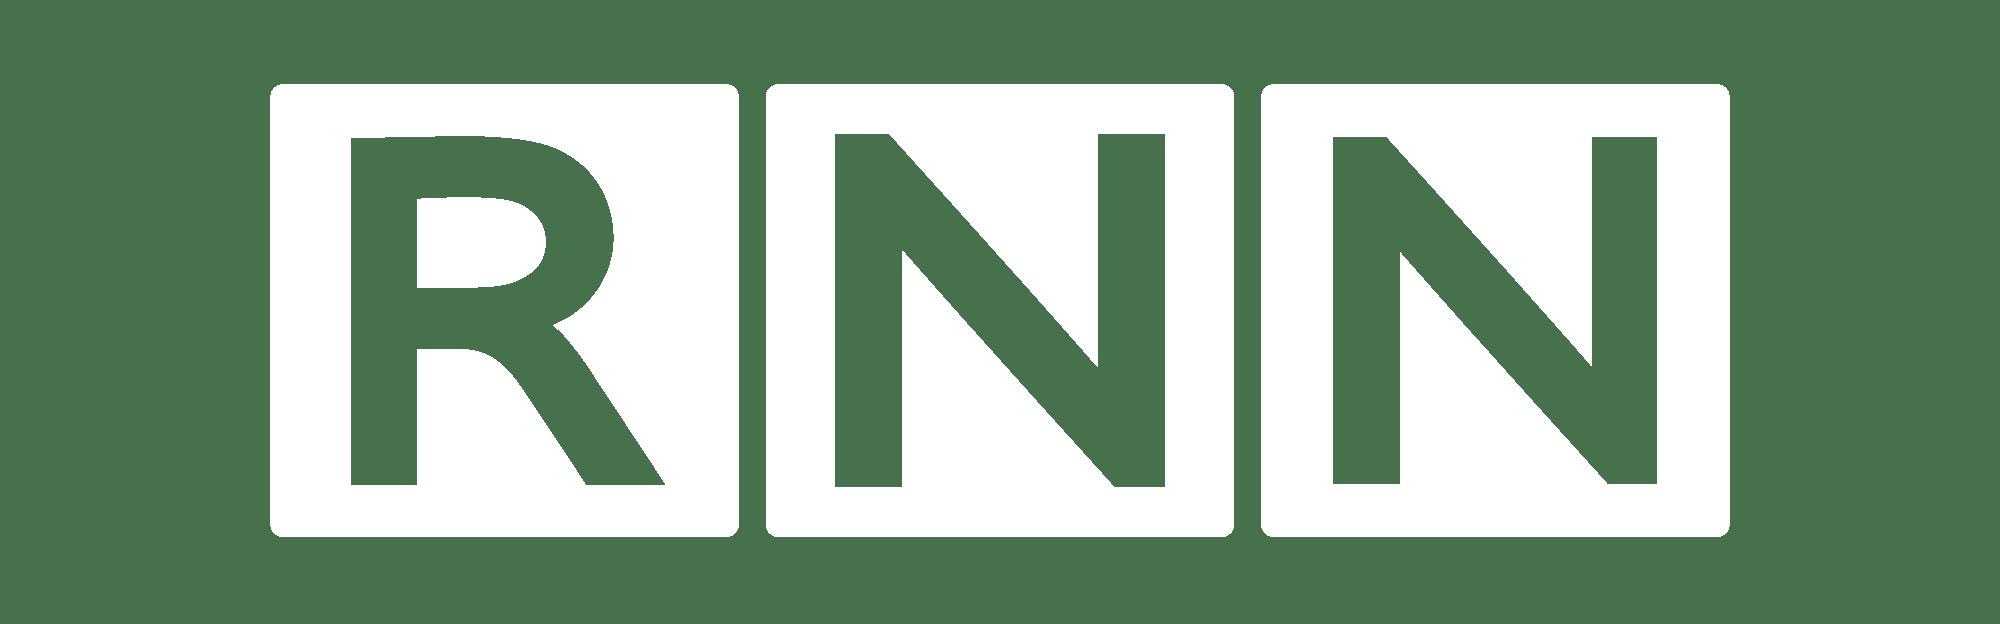 RNN Red Nacional De Noticias